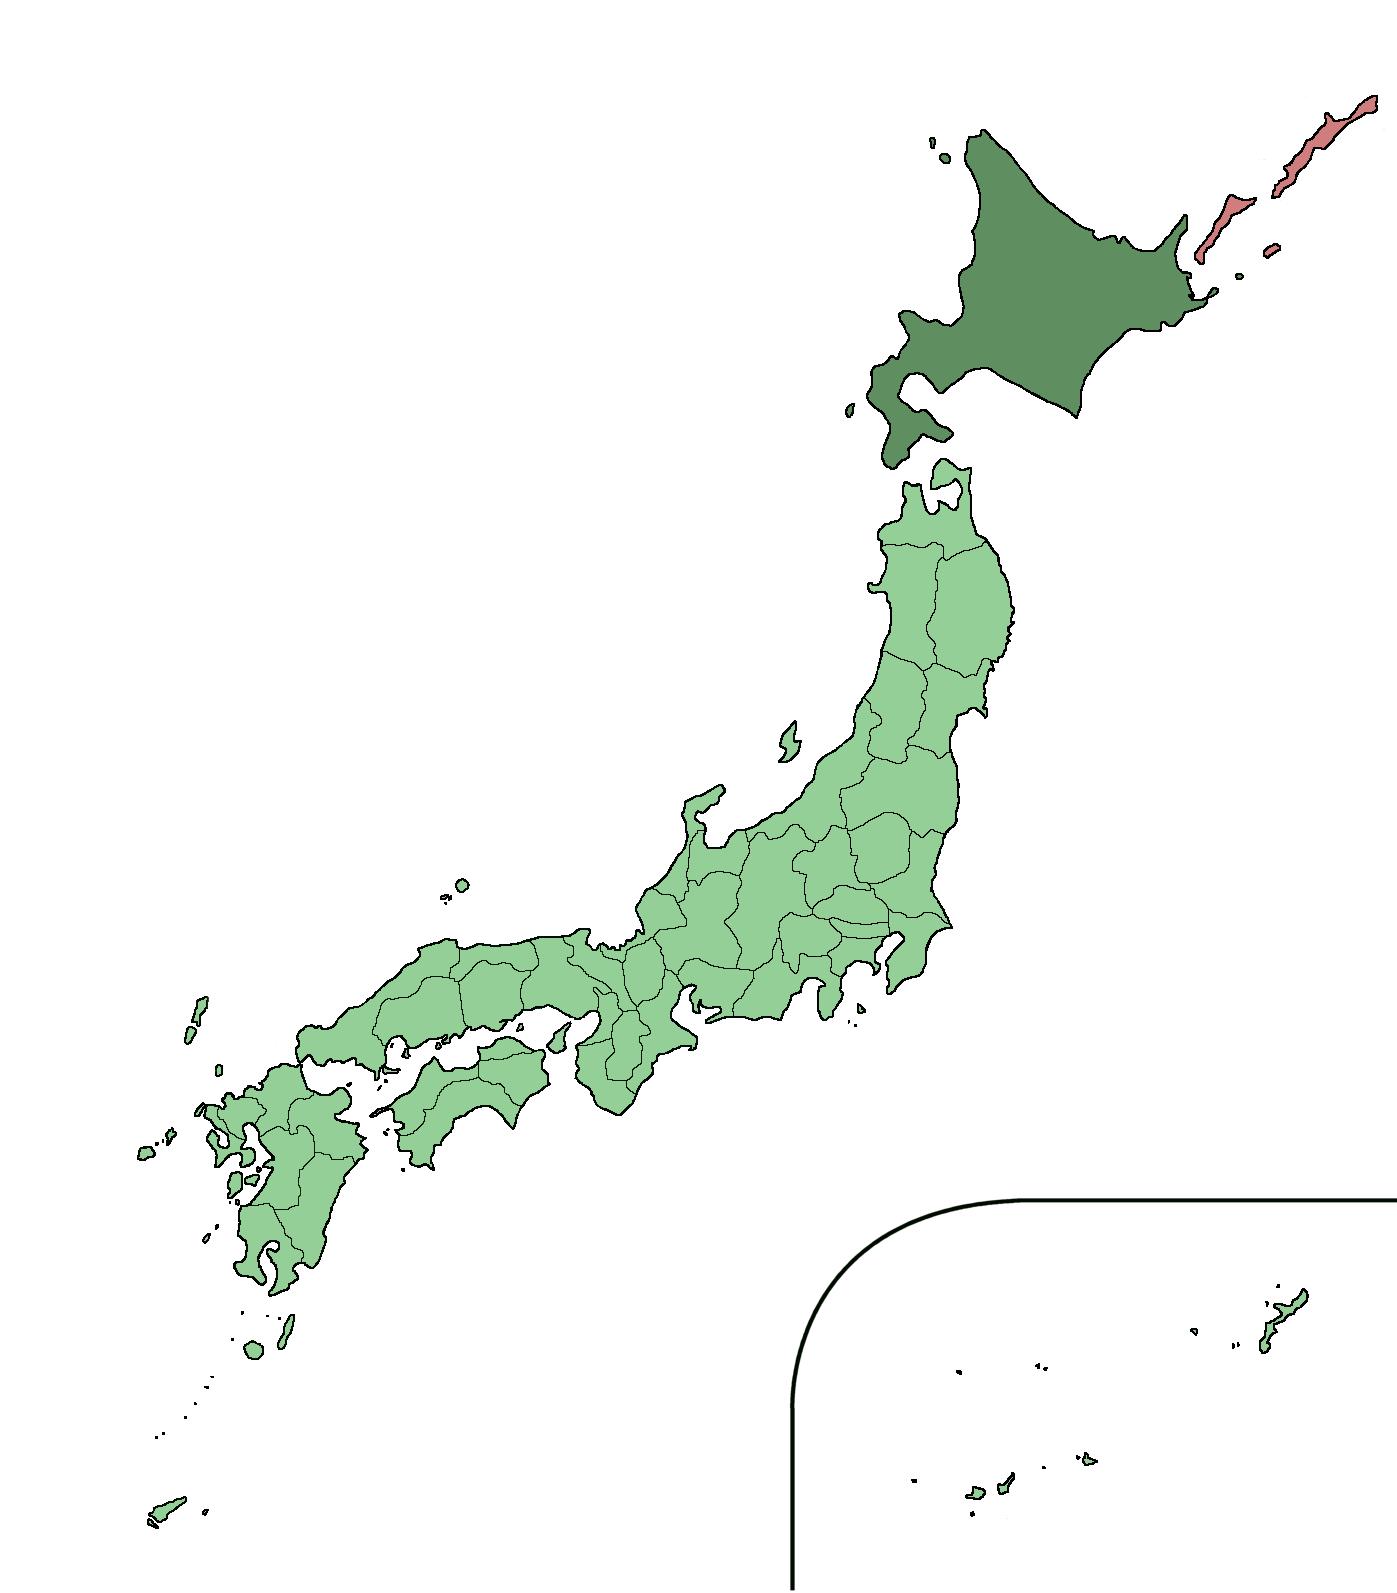 FileJapan Hokkaido Largepng Wikimedia Commons - Japan map large size